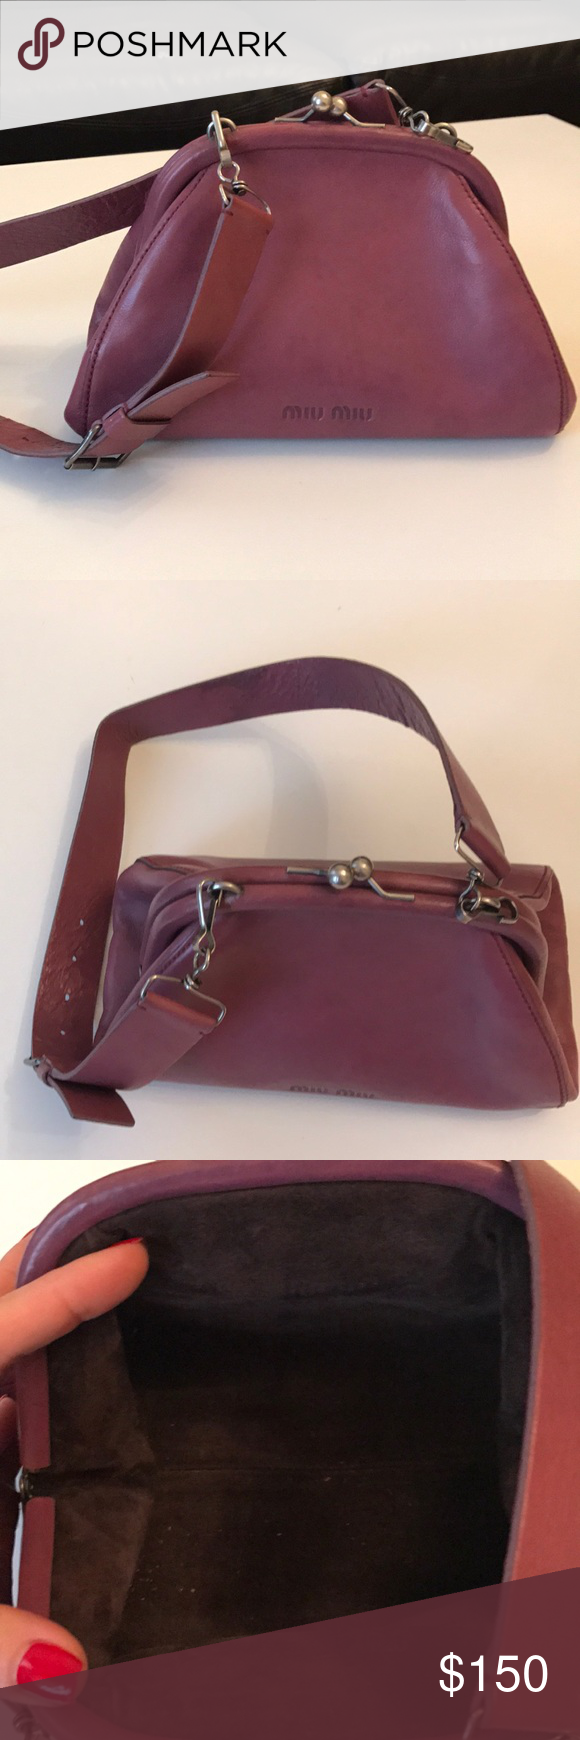 Miu miu bag Miu miu hand bag 100% authentic. 100 % leather. Very fea7f1a698